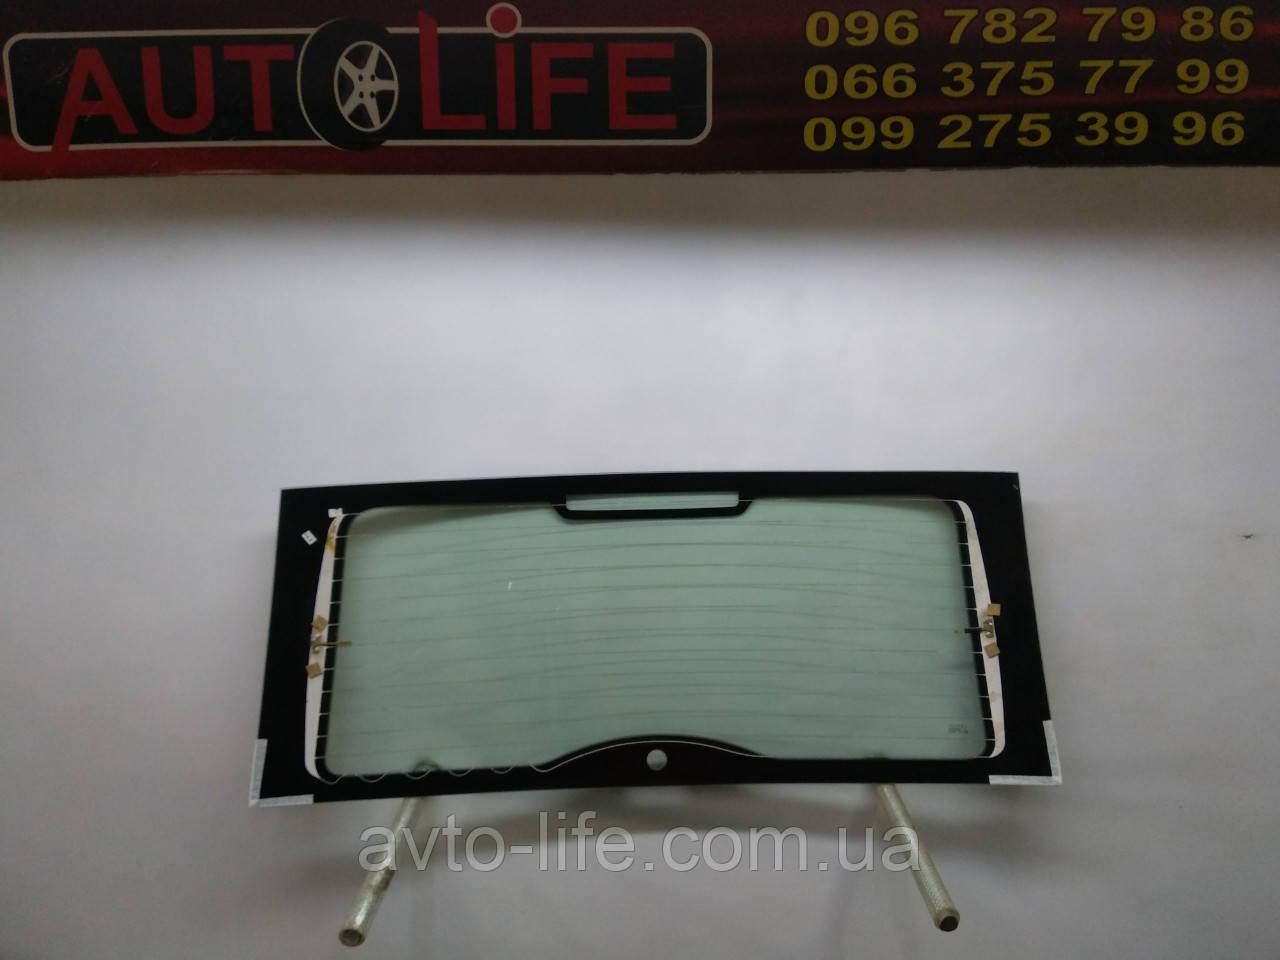 Заднее стекло Skoda Roomster (2007-2014) с обогревом |Автостекло Шкода Румстер| Доставка по Украине | ГАРАНТИЯ